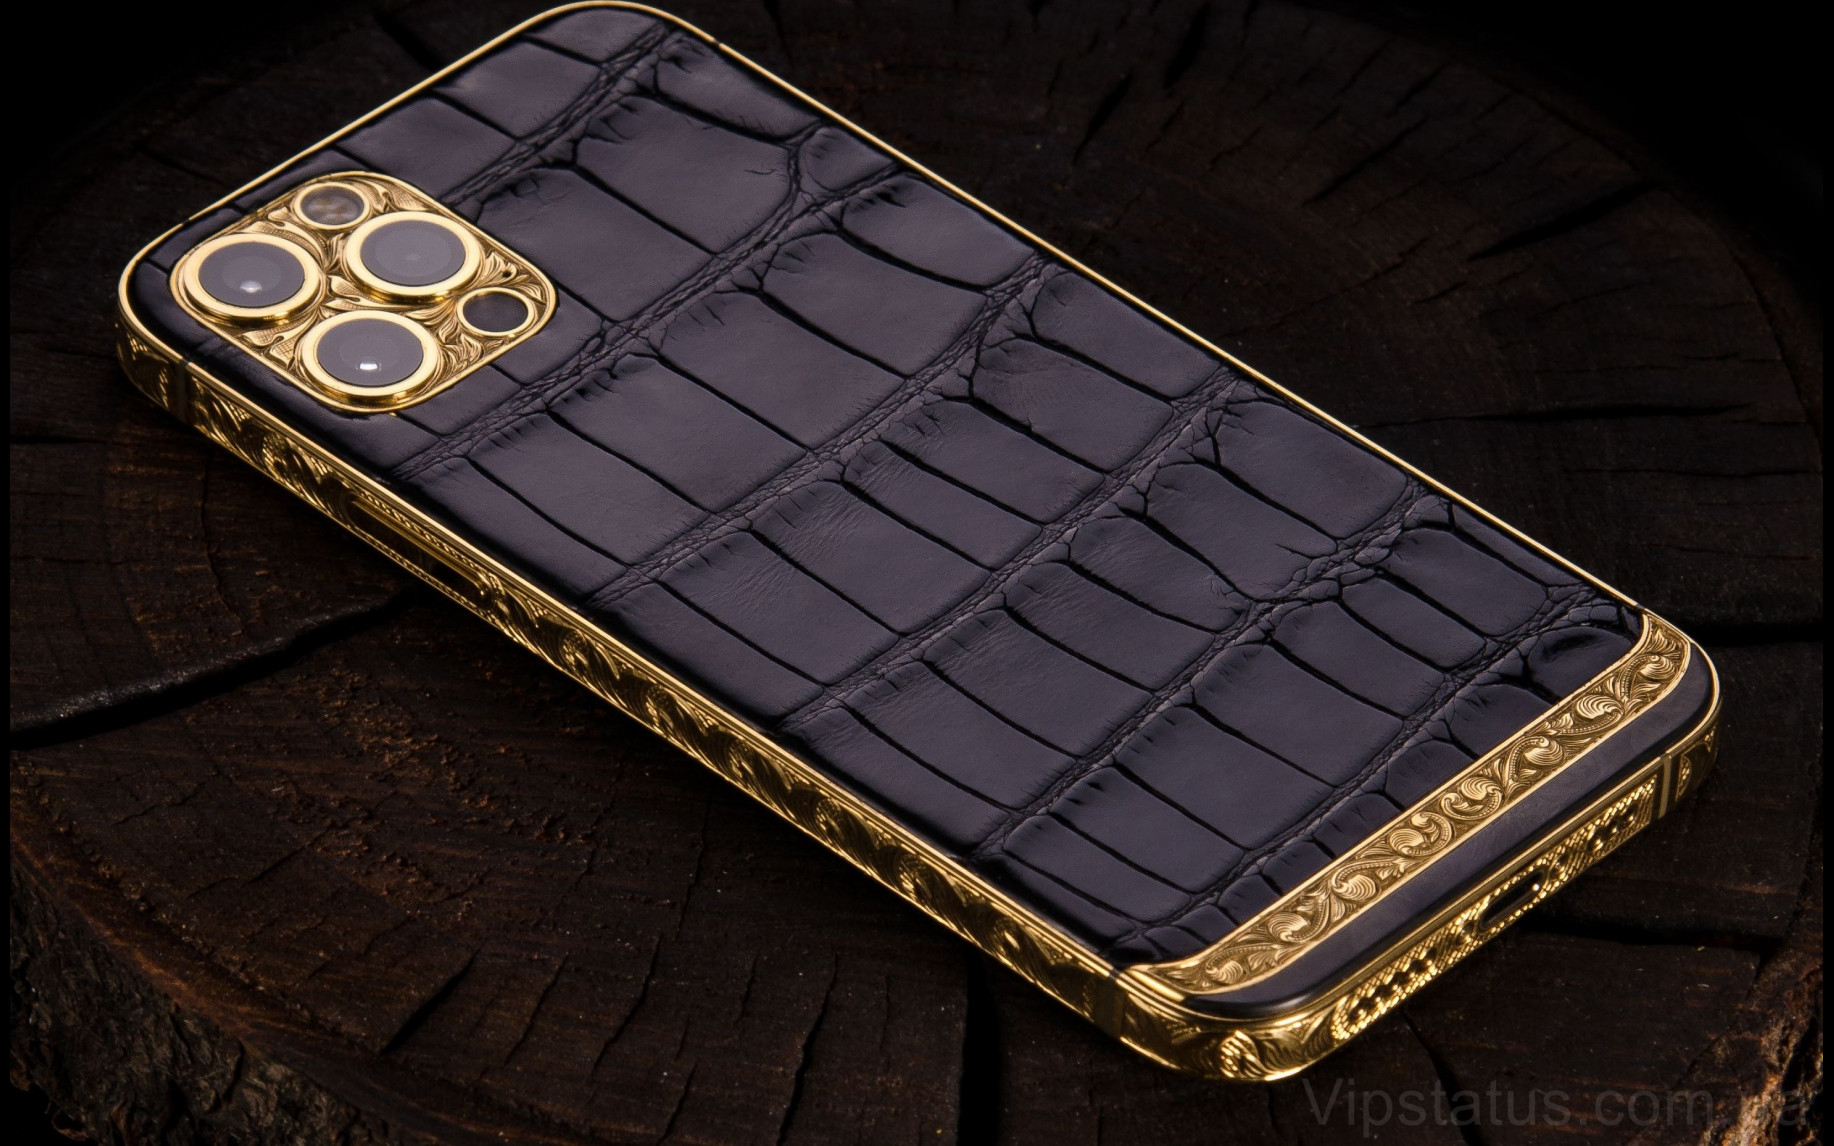 Elite Gold Edition IPHONE 12 PRO MAX 512 GB Gold Edition IPHONE 12 PRO MAX 512 GB image 4